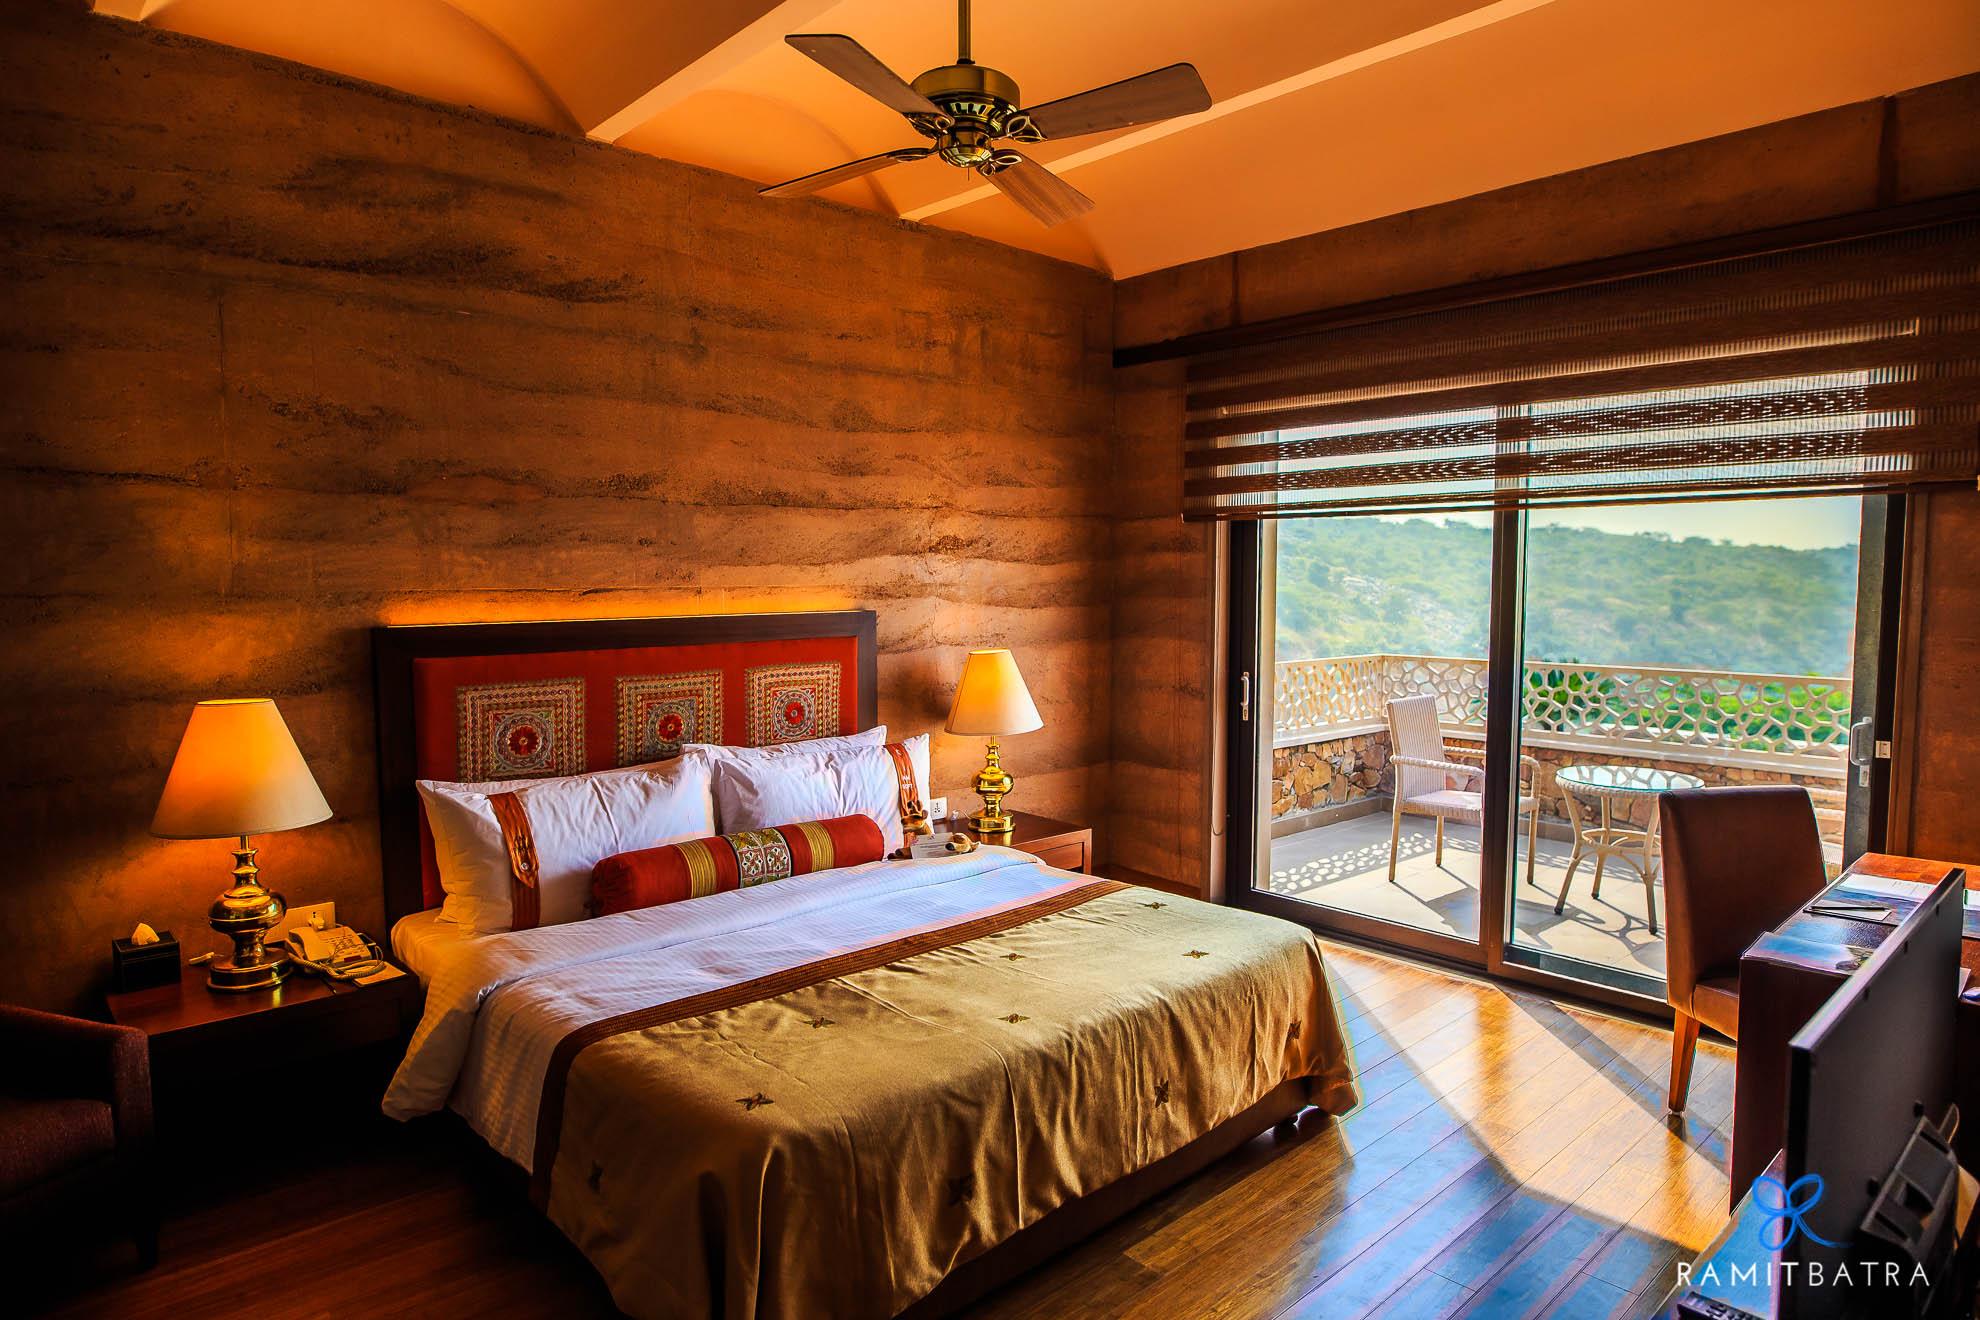 lalit-mangar-hotel-near-delhi-ramitbatra-011